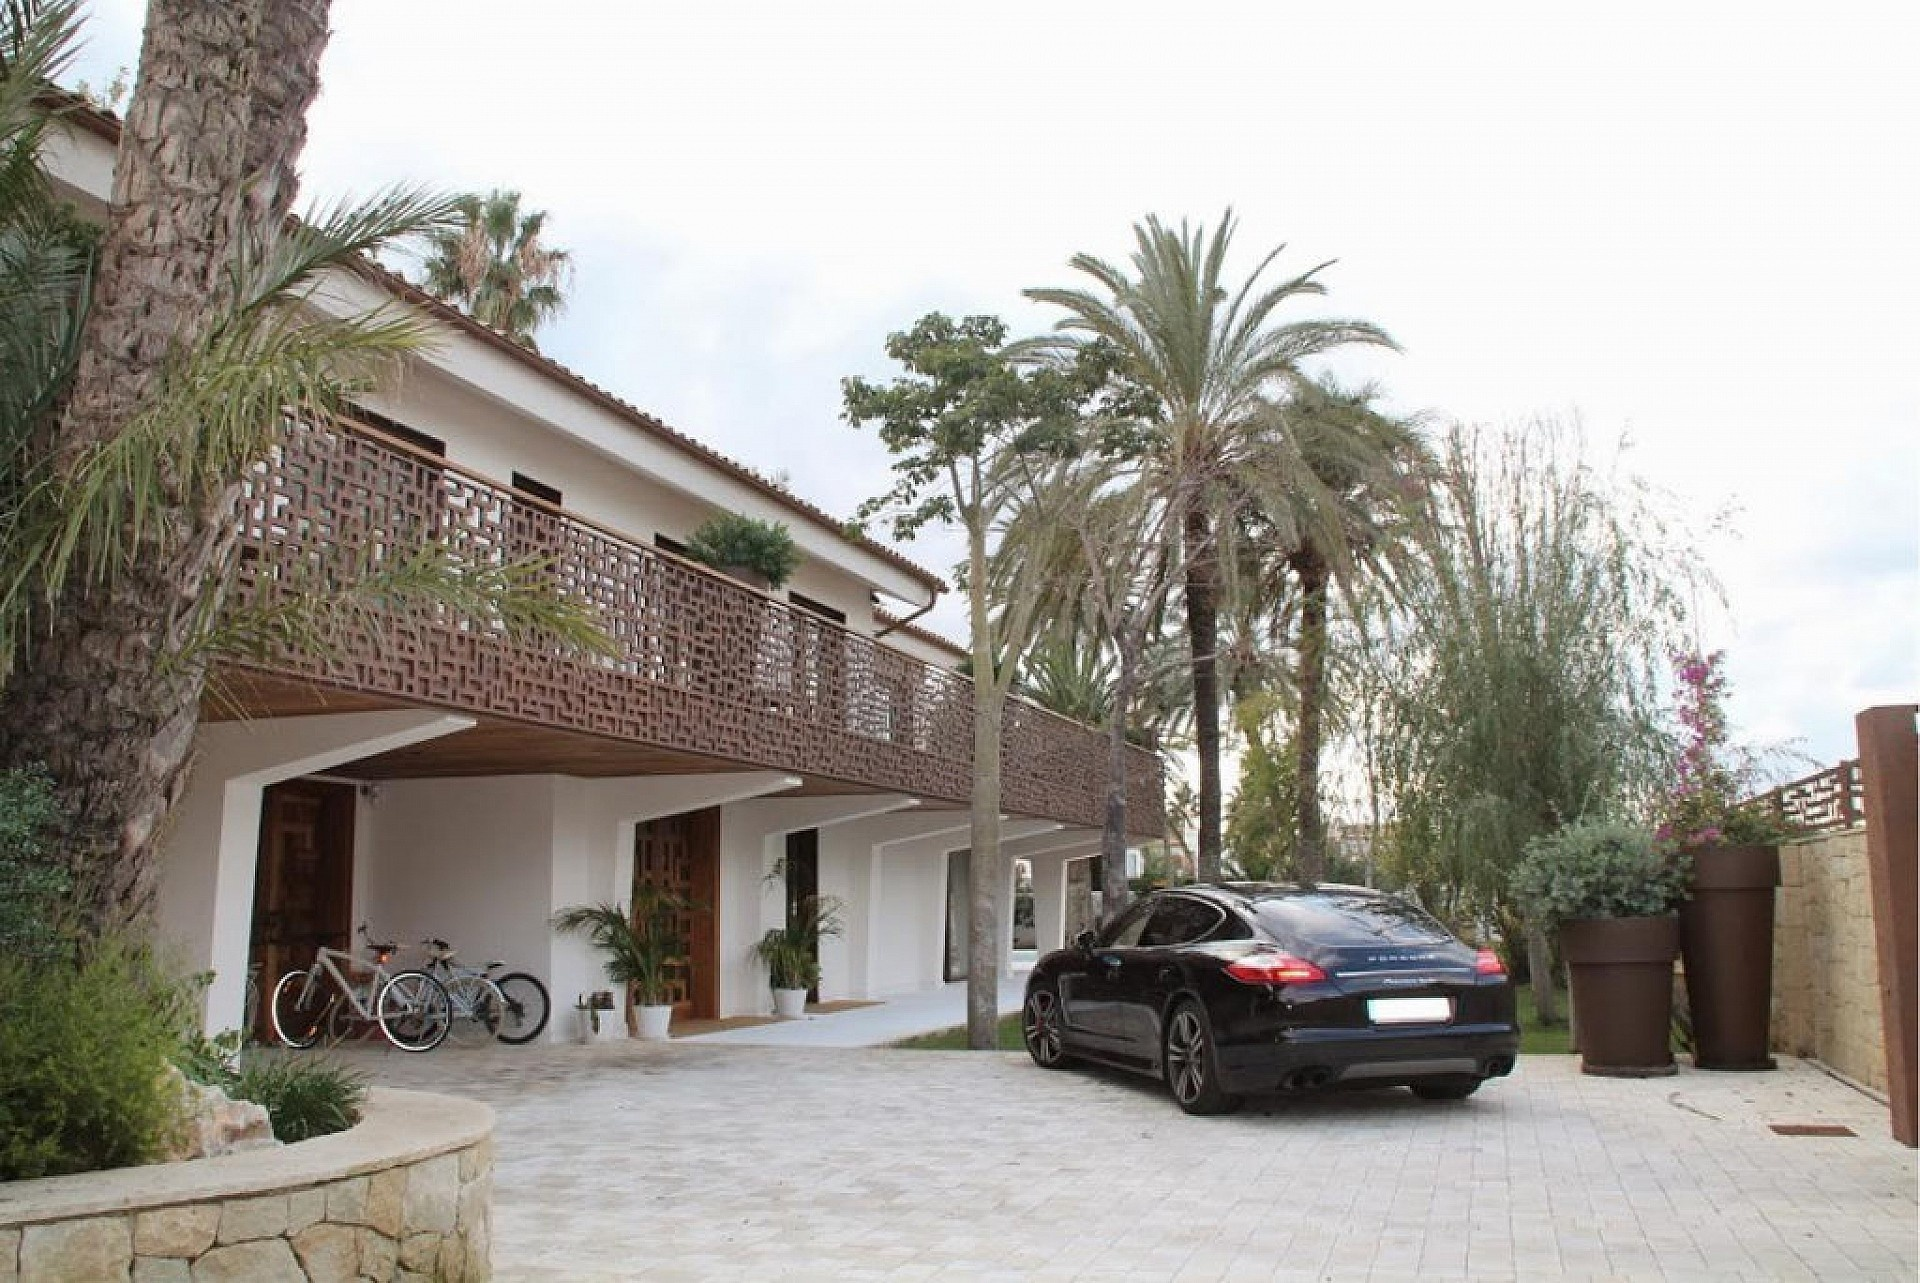 w_denia-huis-tekoop-costa-blanca-spanje-211.jpg